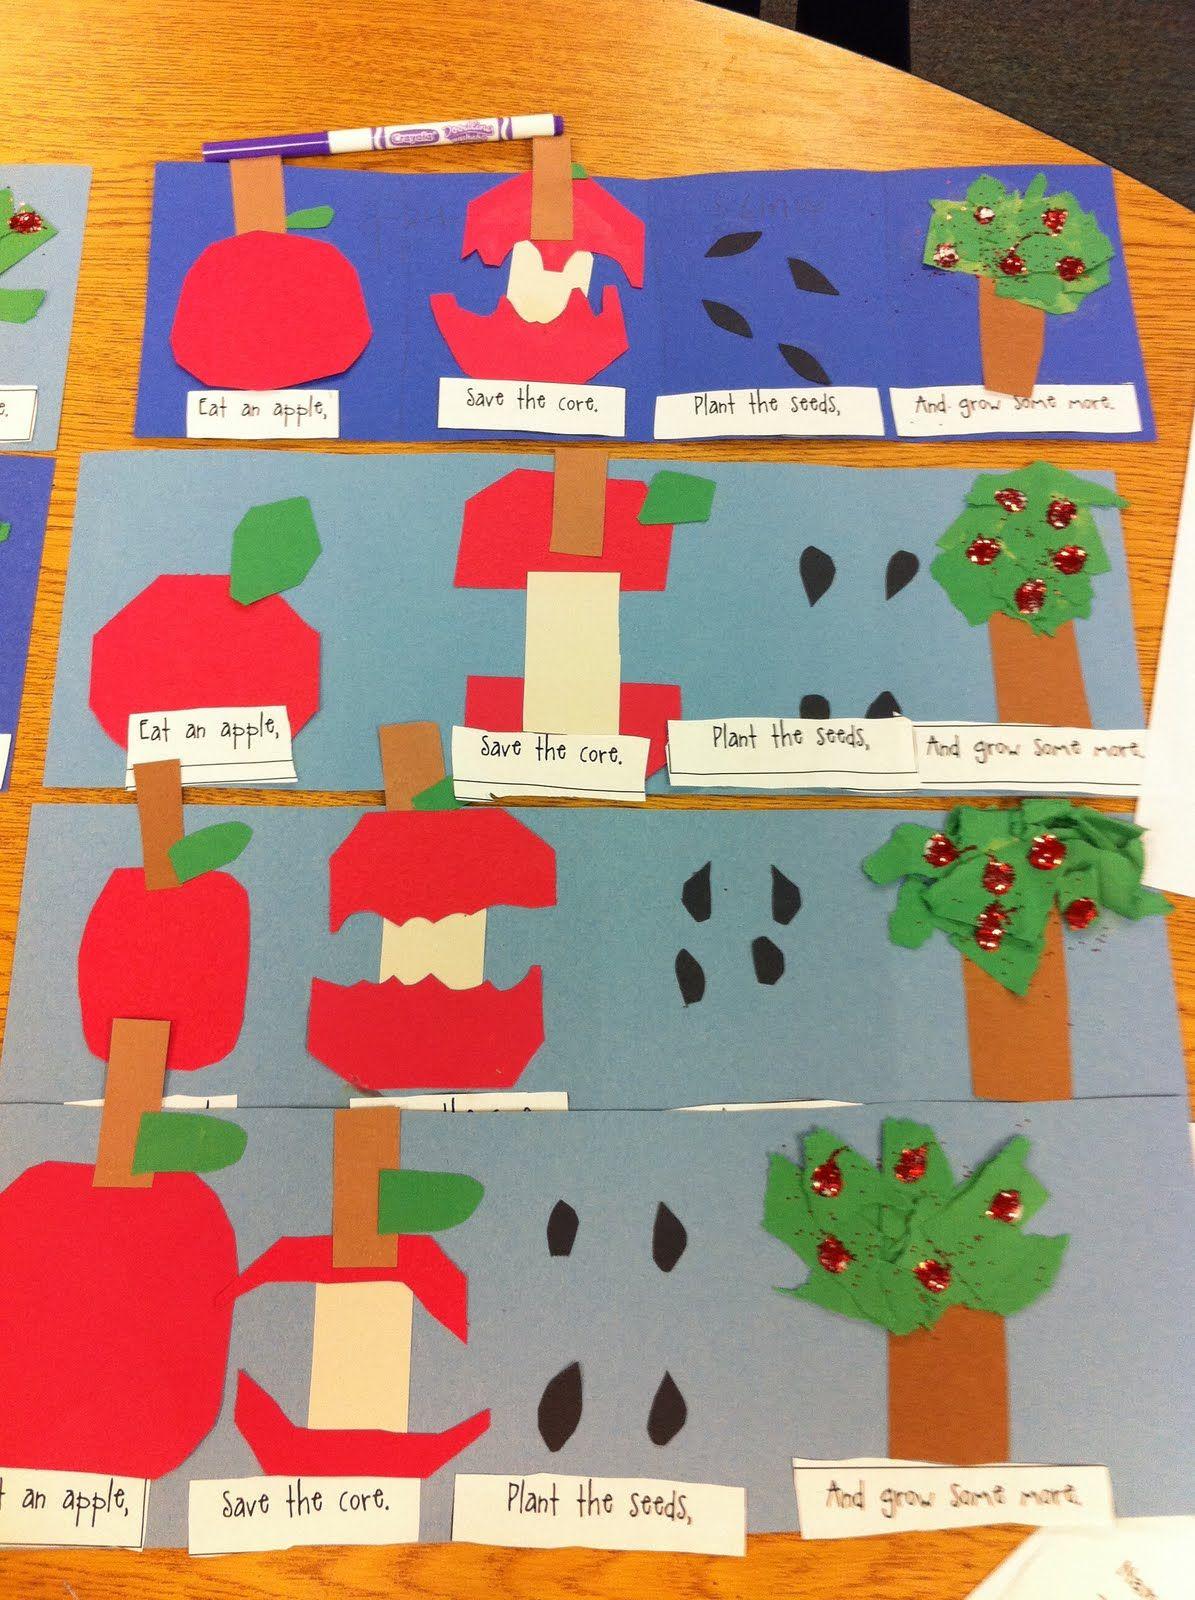 Img 0710 Jpg 1 195 1 600 Pixel Apfel Thema Kinder Alphabet